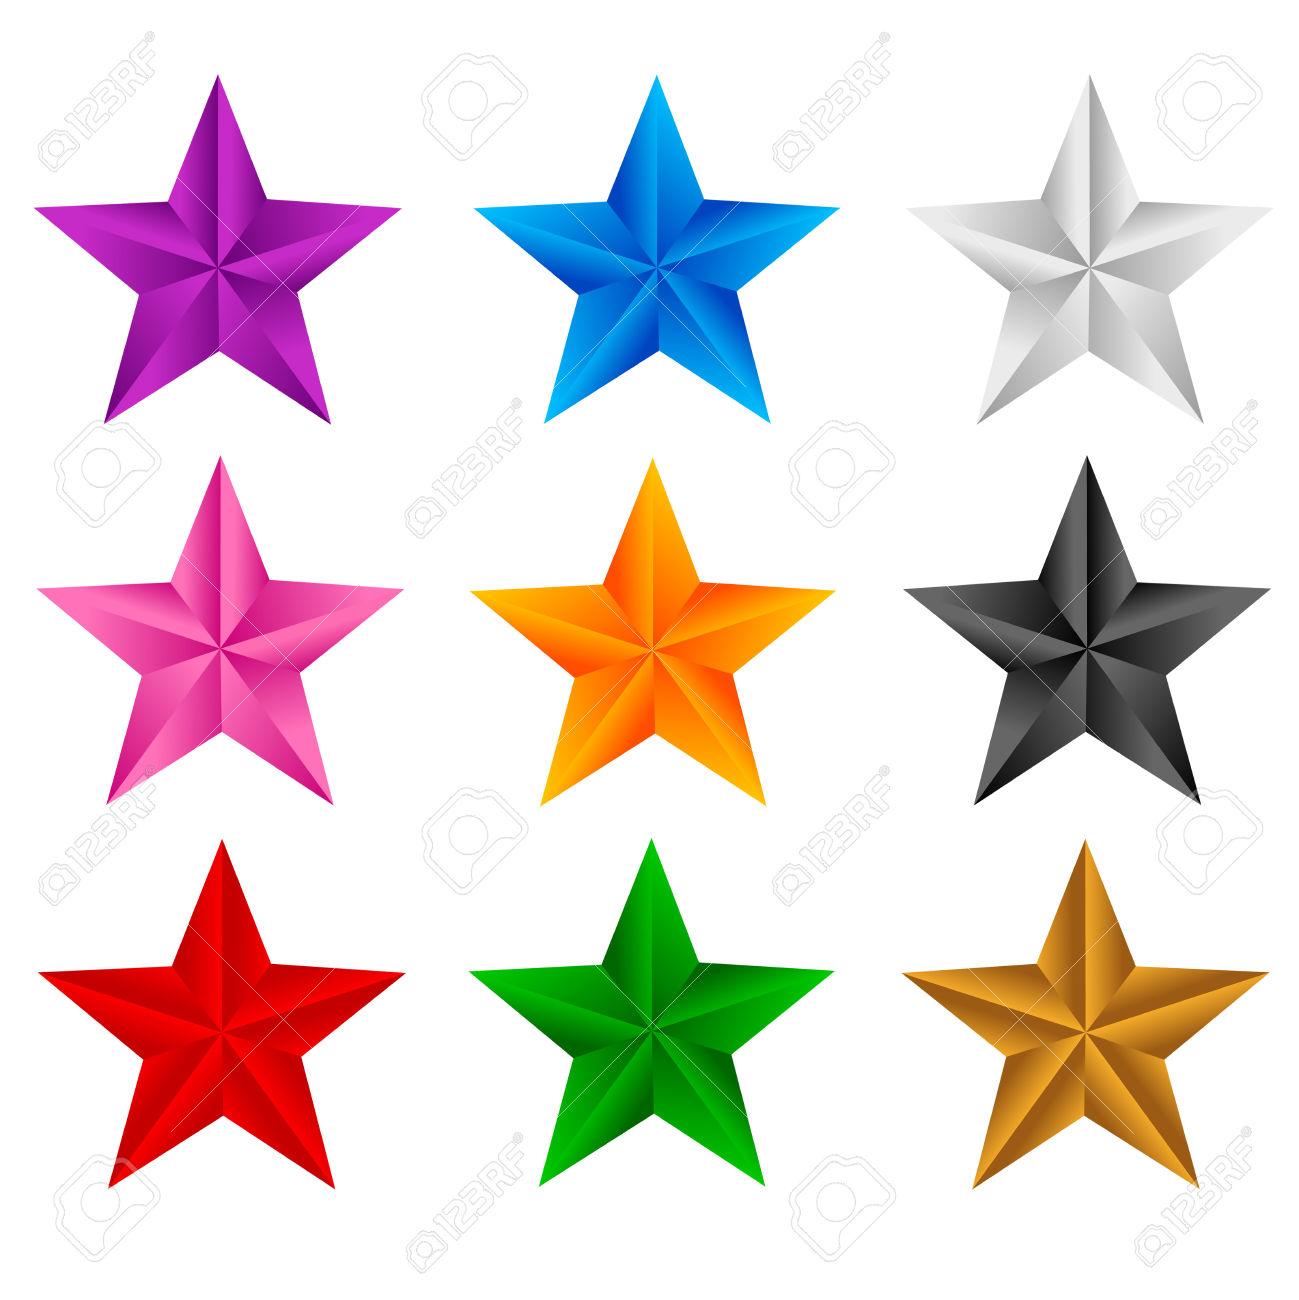 1299x1300 Star Clipart White Background